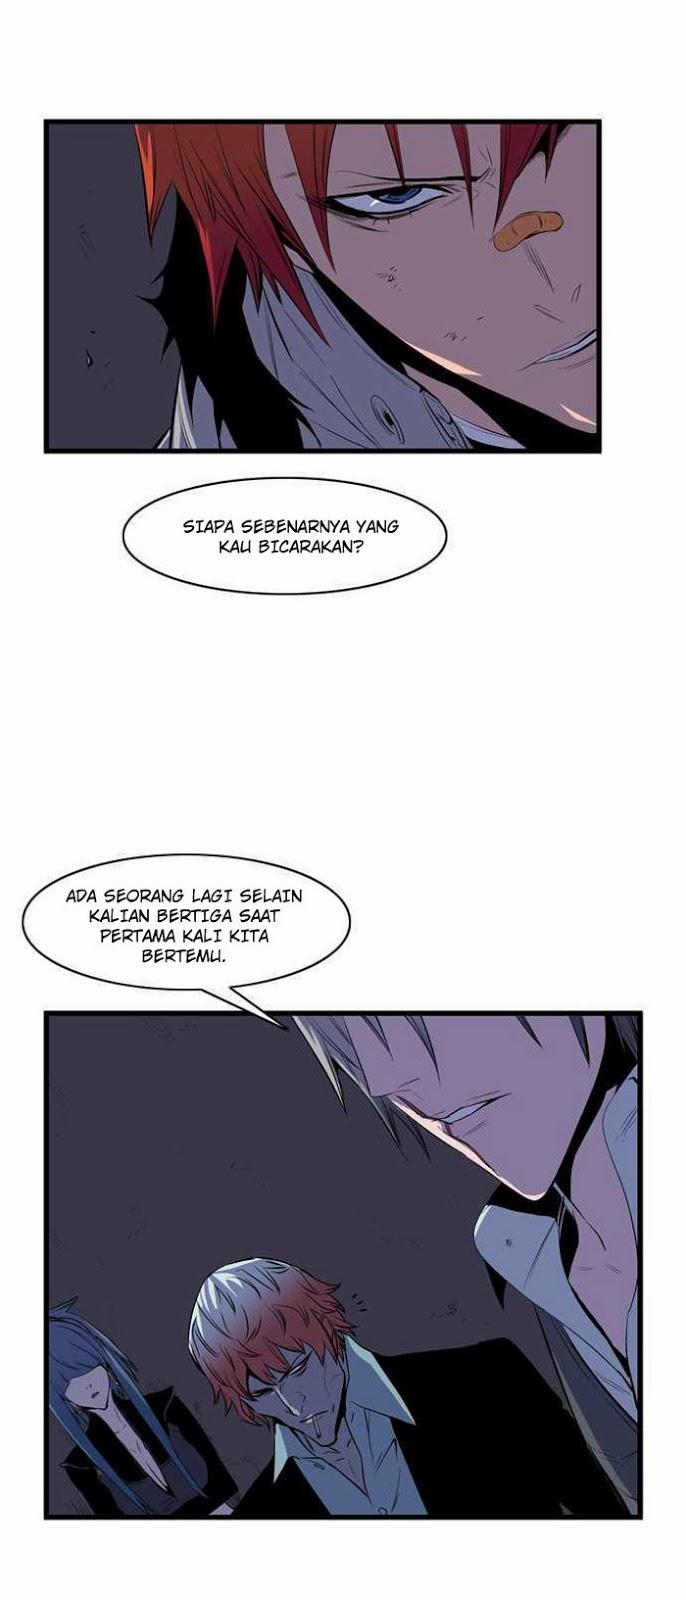 Komik noblesse 067 68 Indonesia noblesse 067 Terbaru 6|Baca Manga Komik Indonesia|